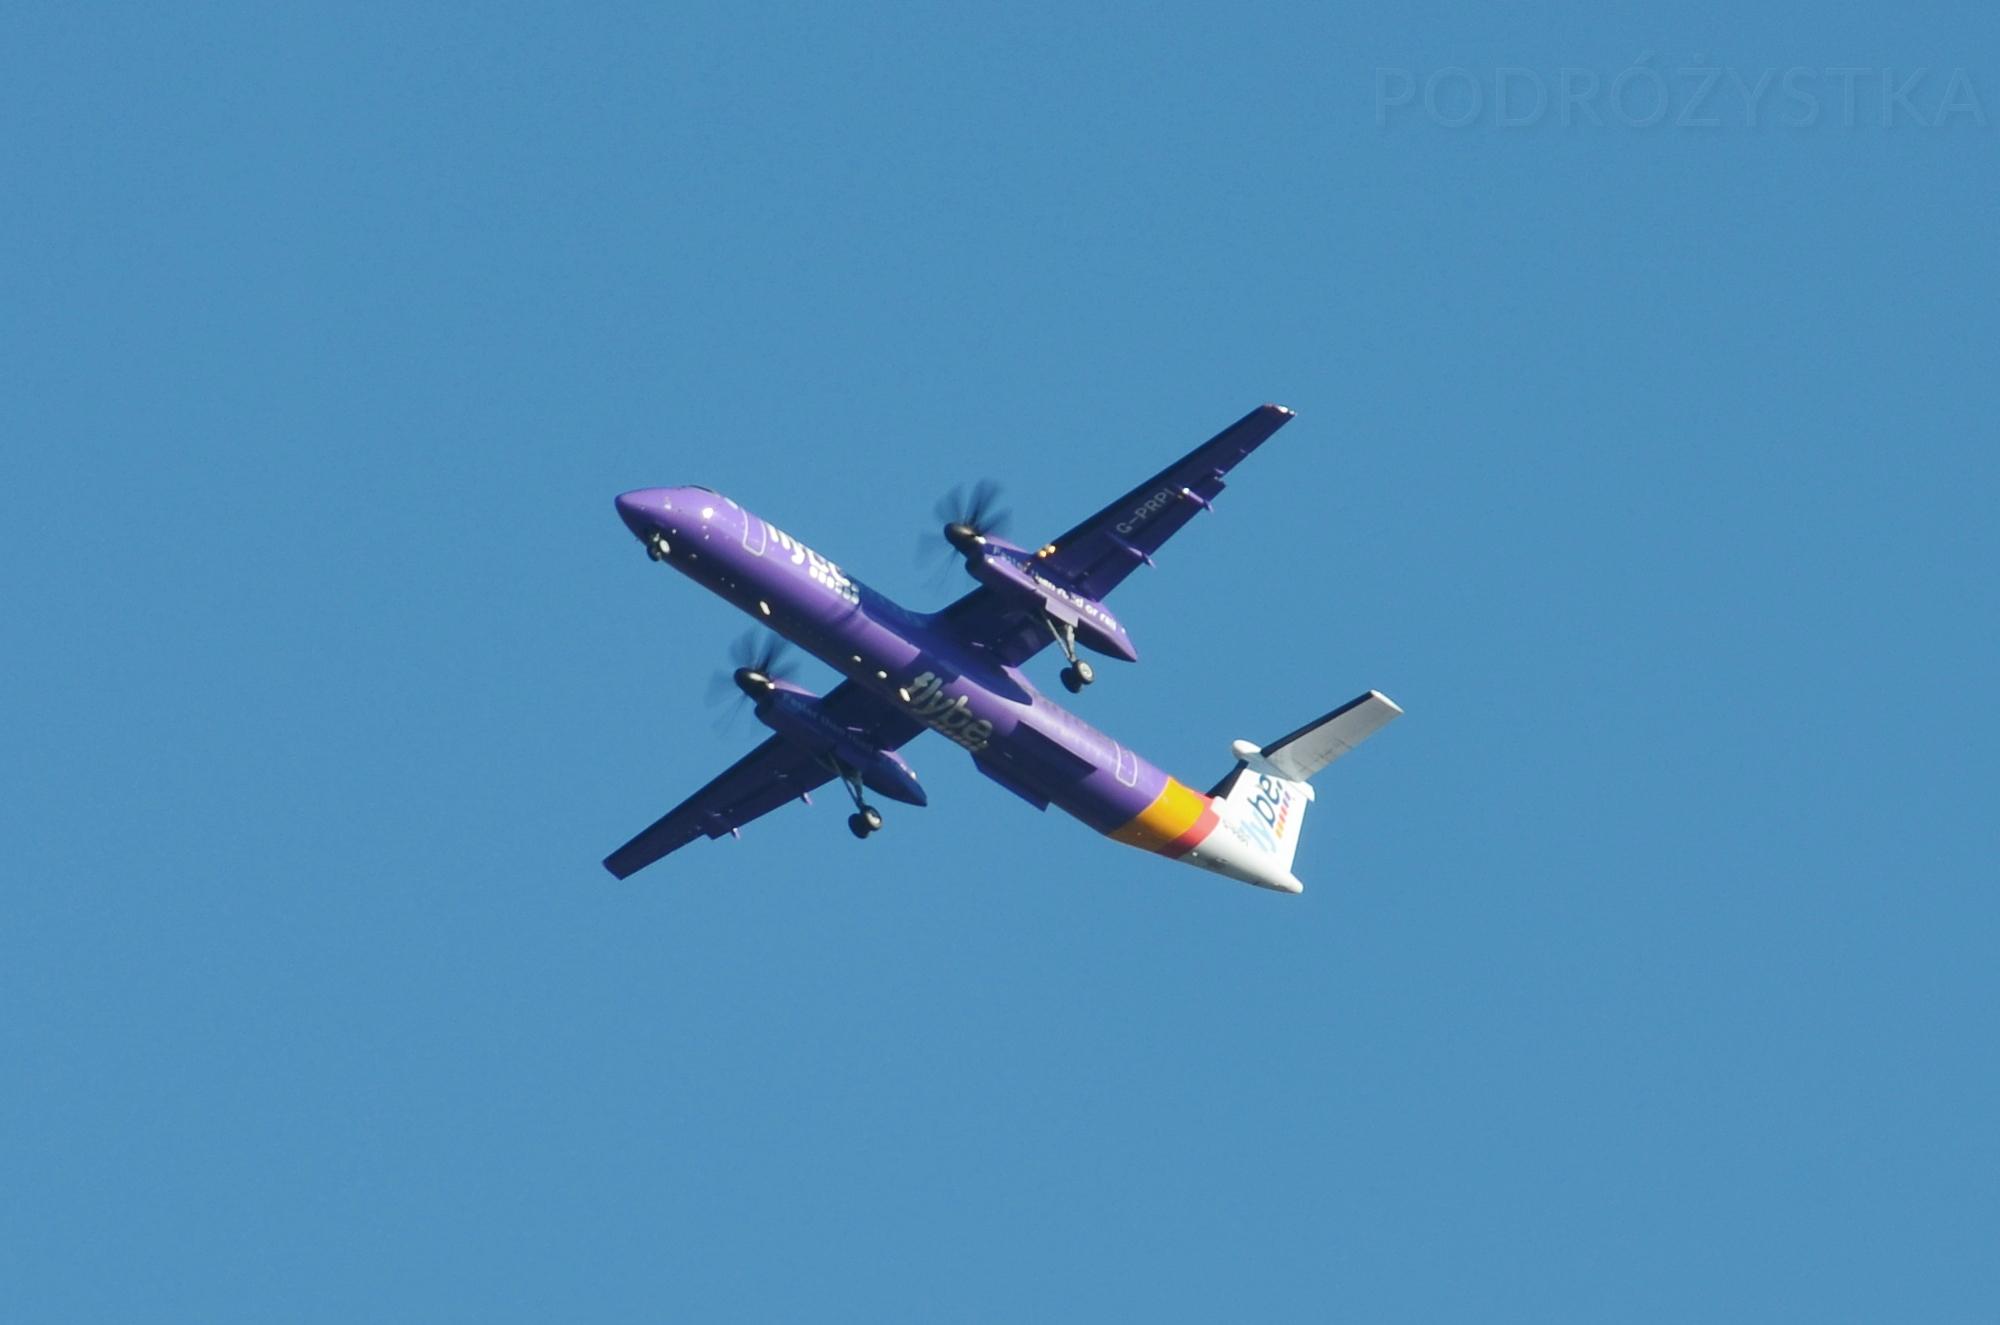 UK_III_21_London_Eye_airplane_spotting_50_size_watermark